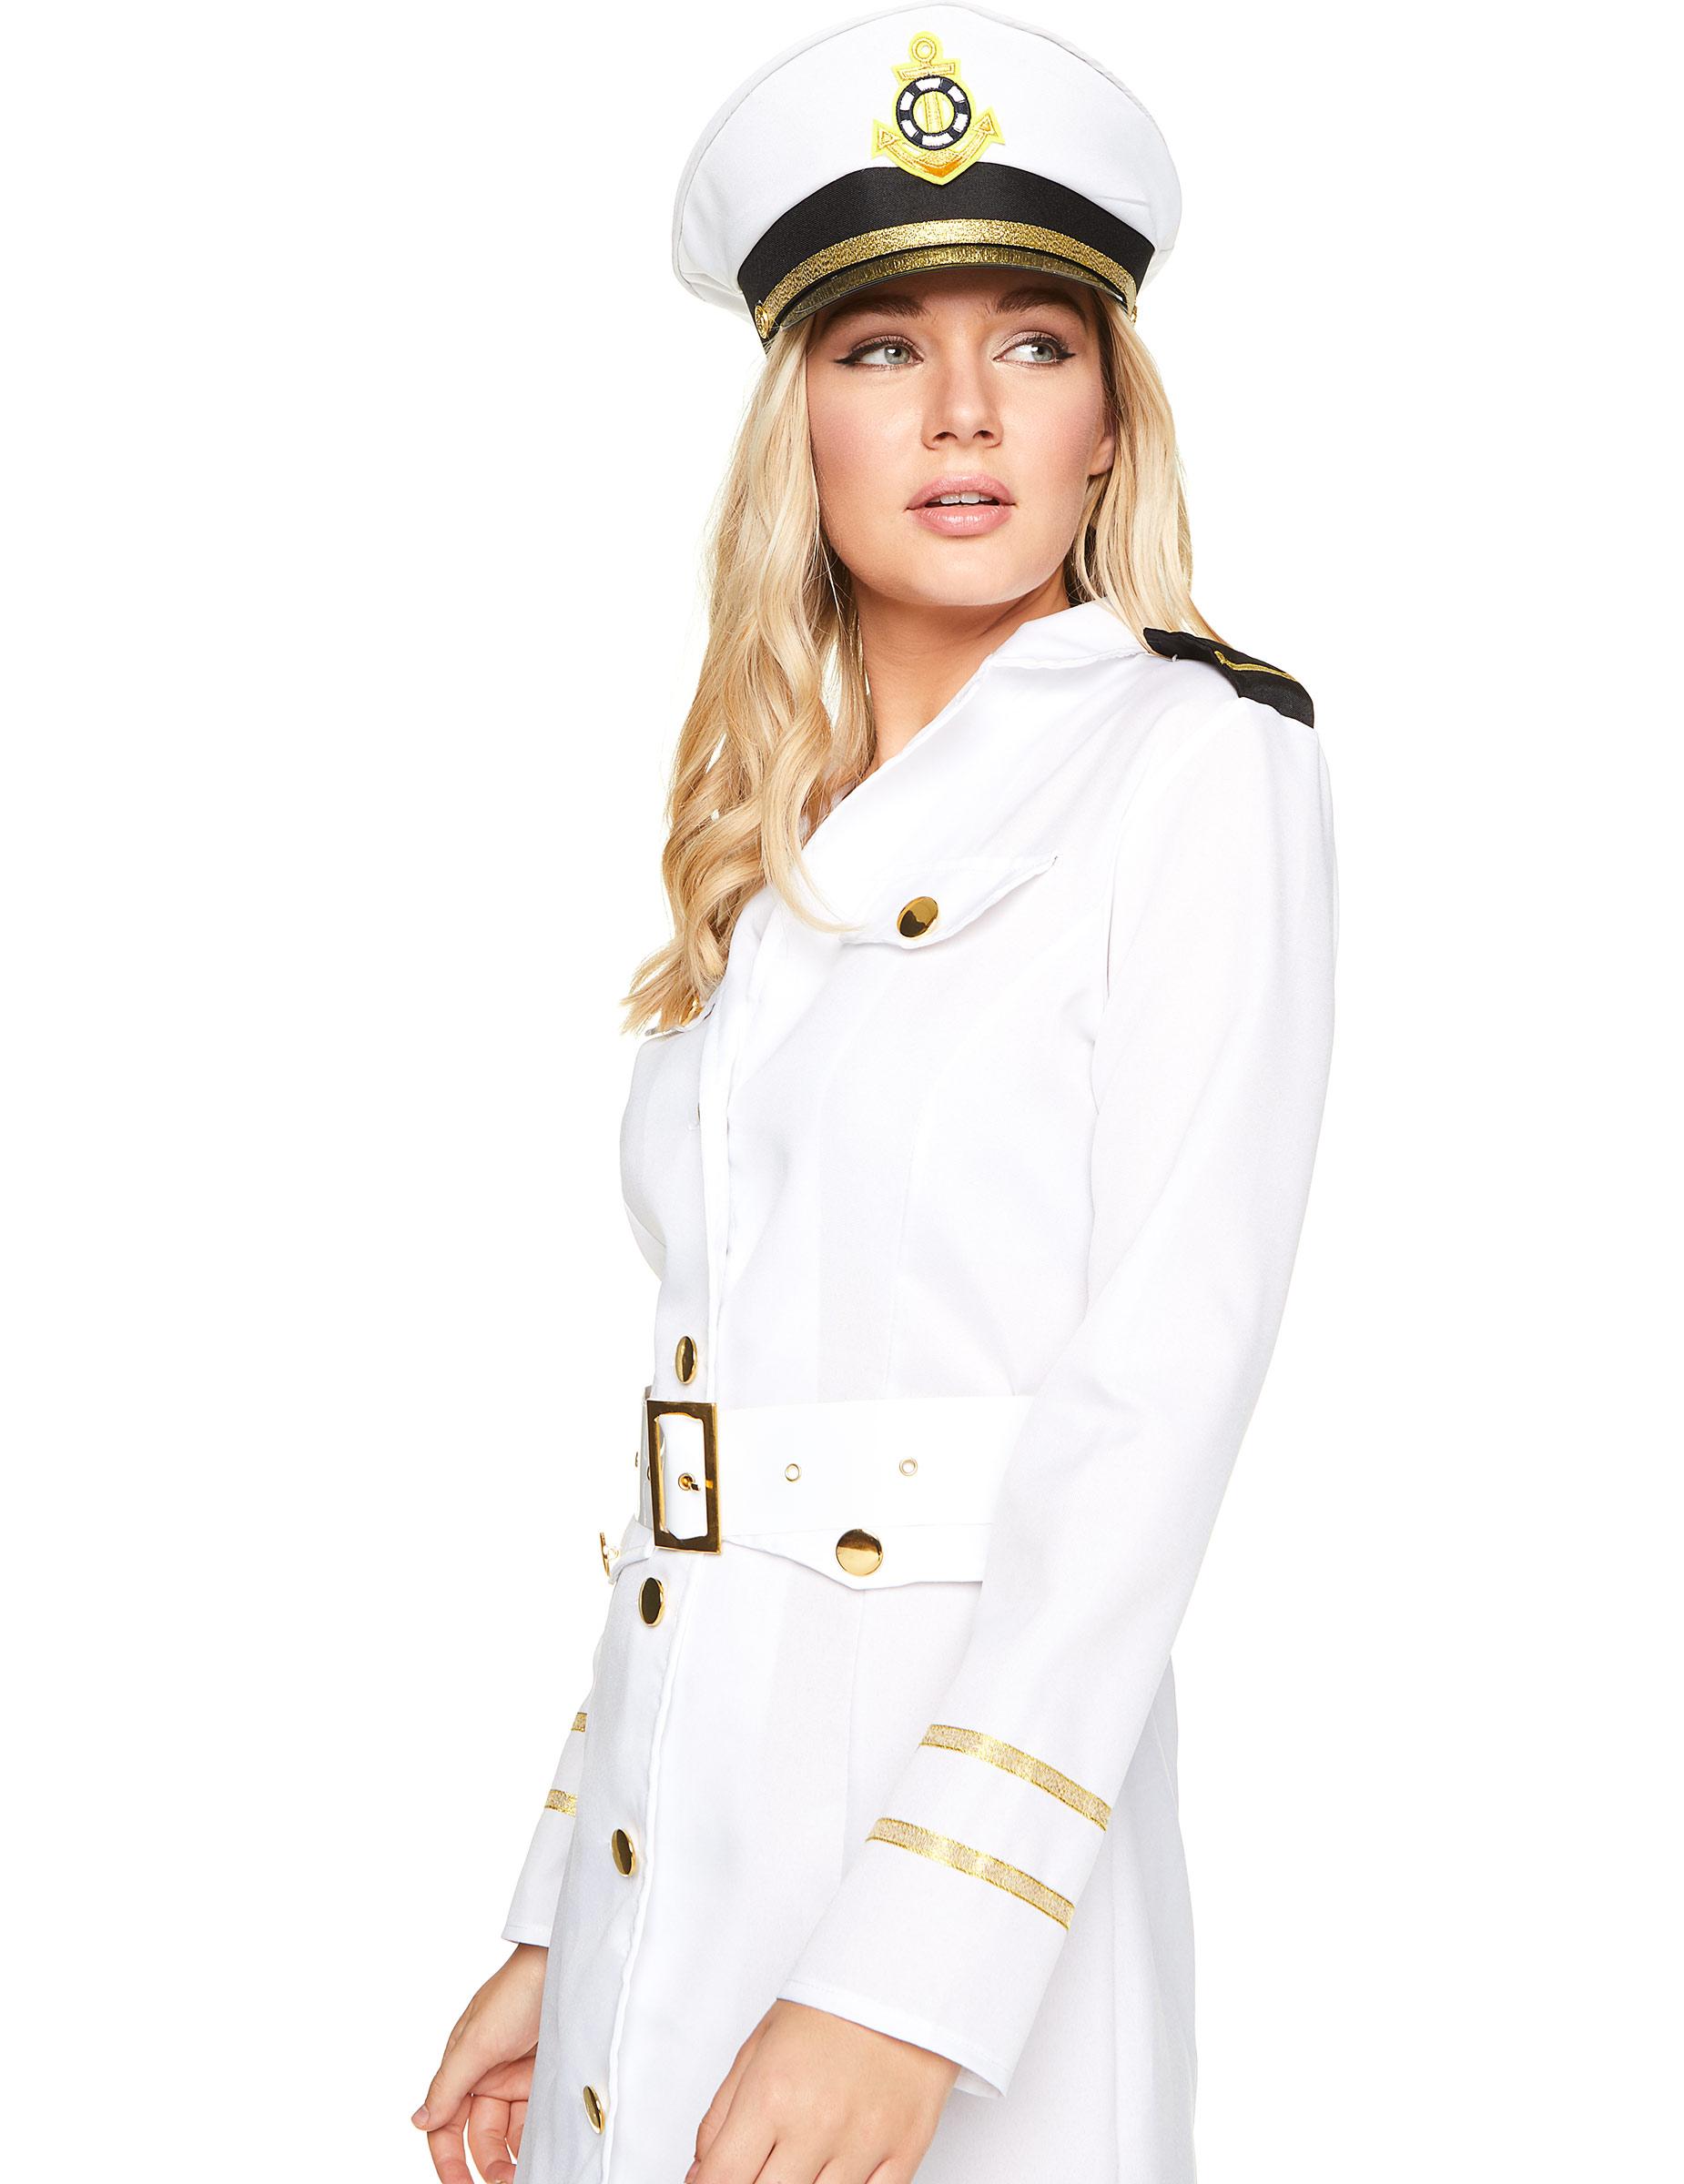 cceae4a14 Disfraz capitana marinera mujer